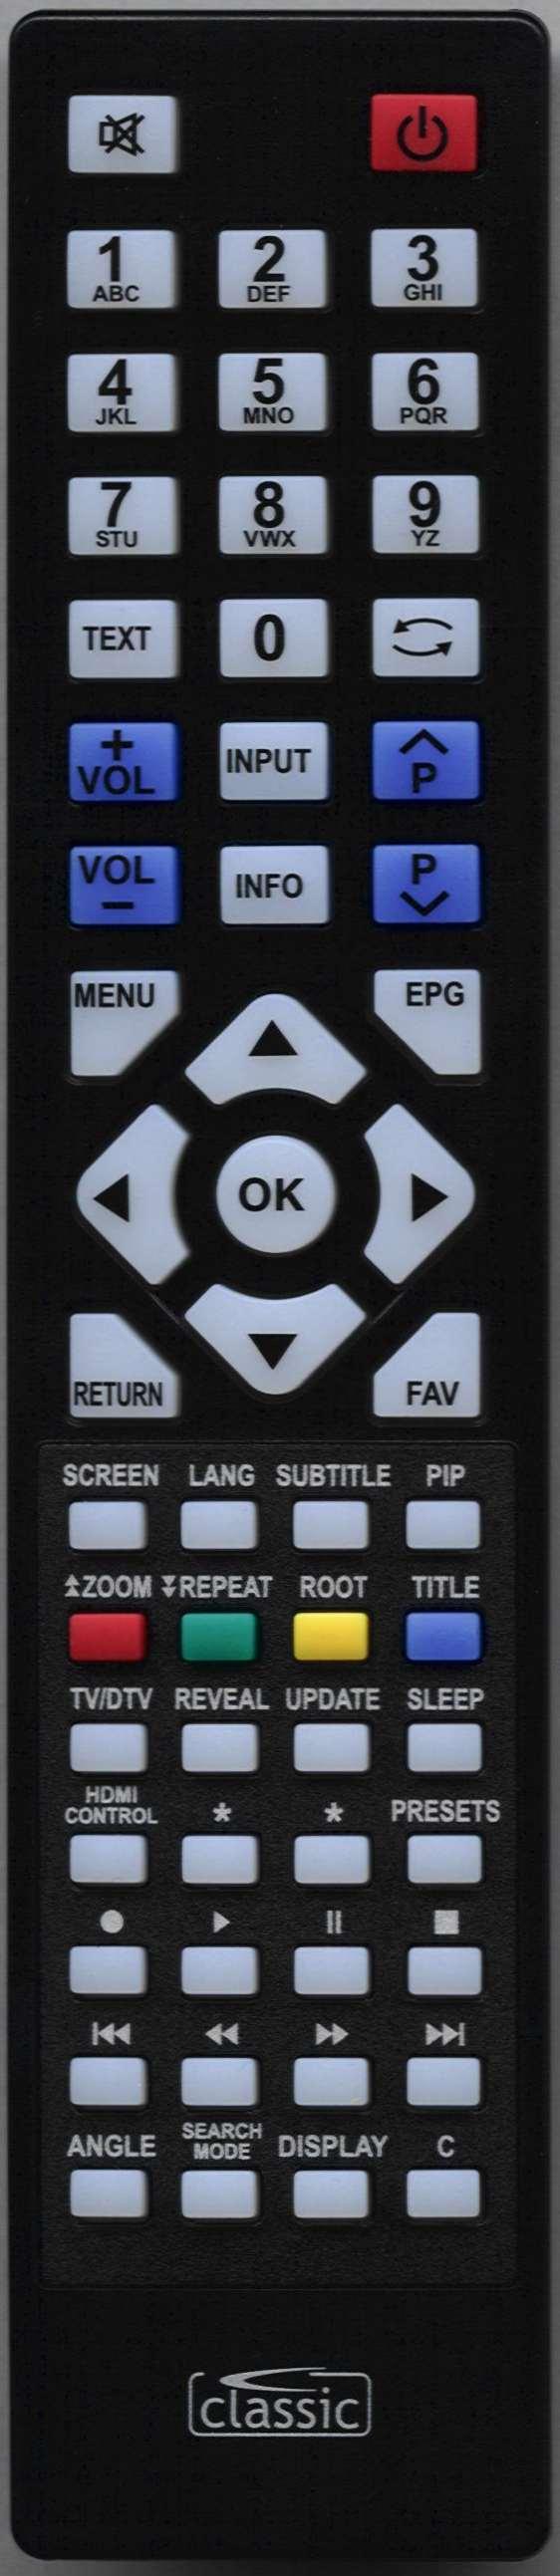 POLAROID P22LEDDVD12 Remote Control Alternative